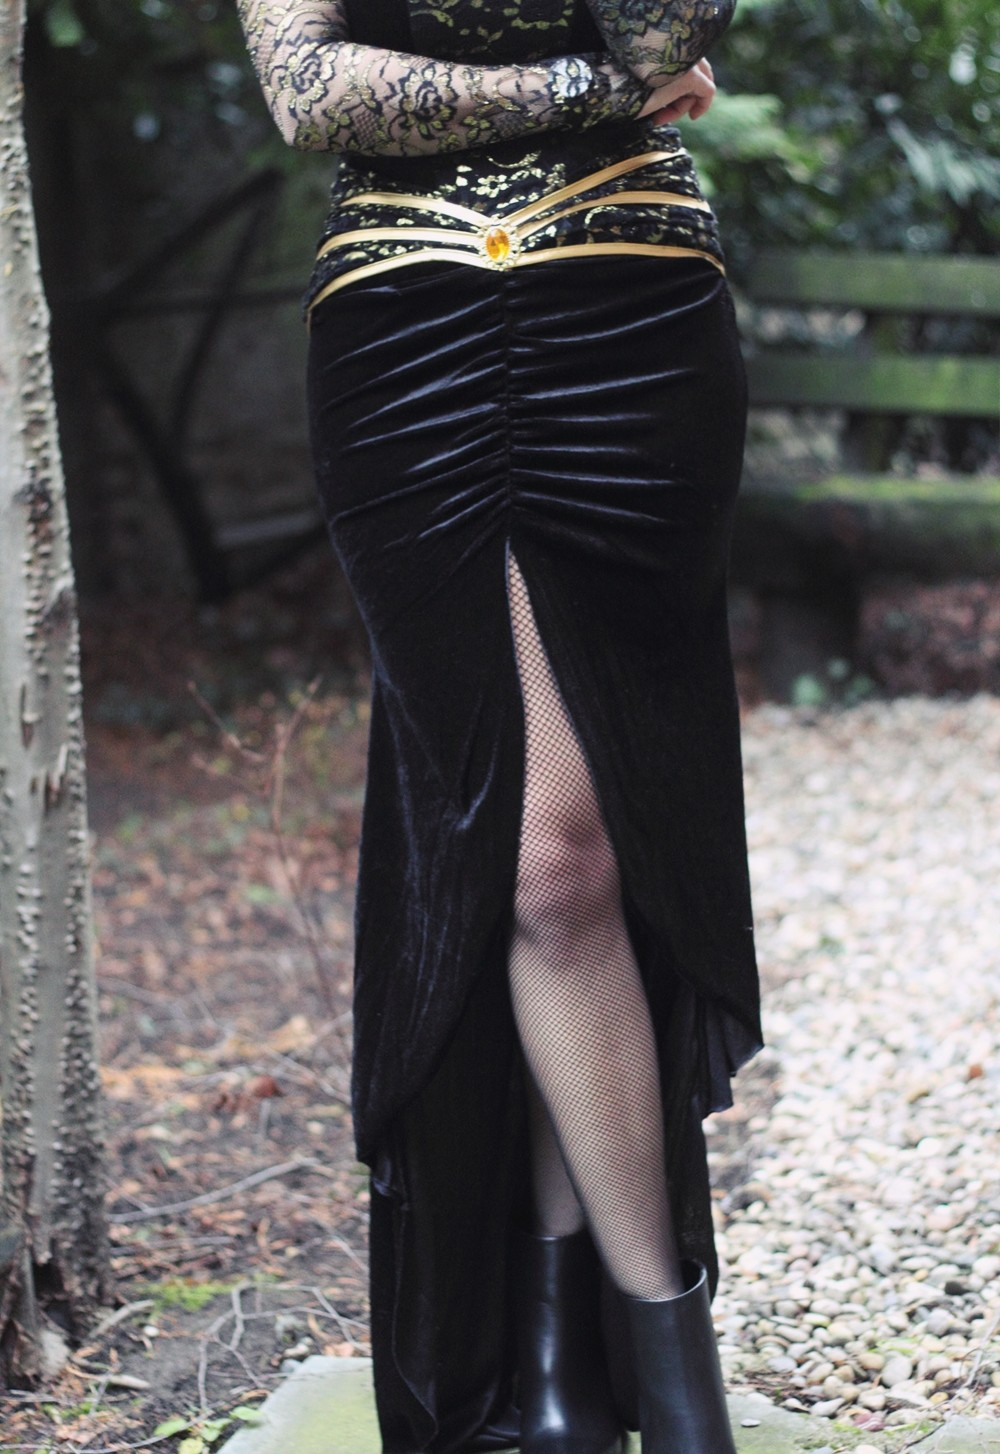 Karneval Megastore Böse Königin Kostüm Fasching Fashionblogger OOTD (11)